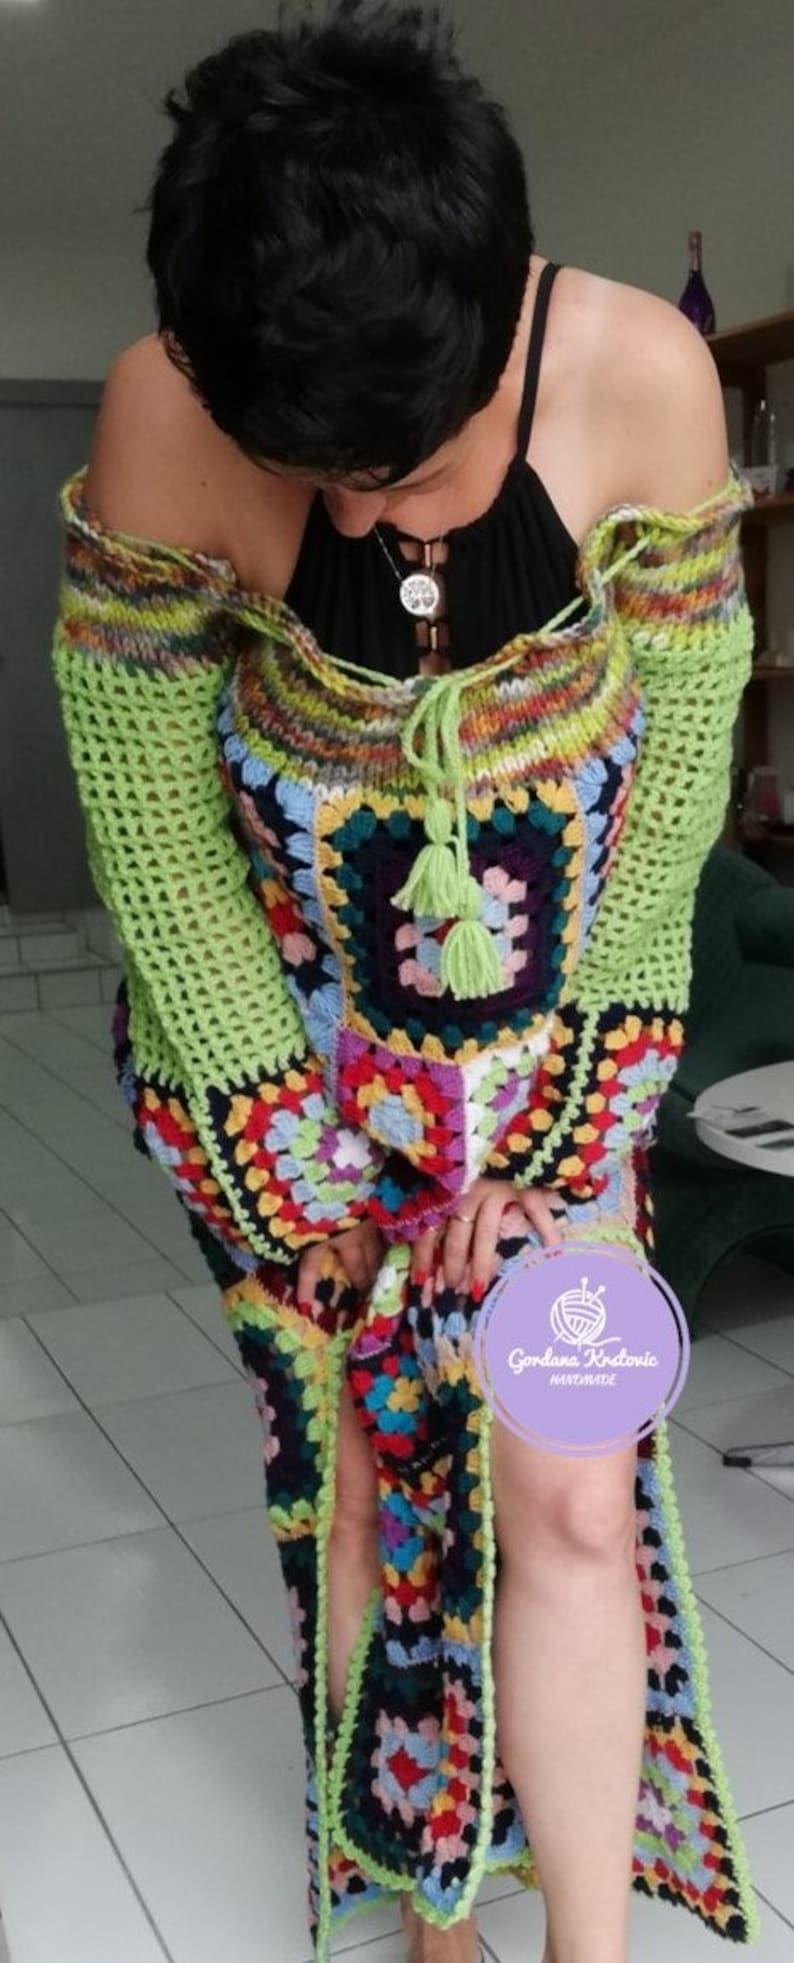 Granny Square dress,Long dress,Spell and Gypsy dress,Hippie Gypsy dress,crochet patchwork dress,crochet dress,maxi dress,multicolor dress